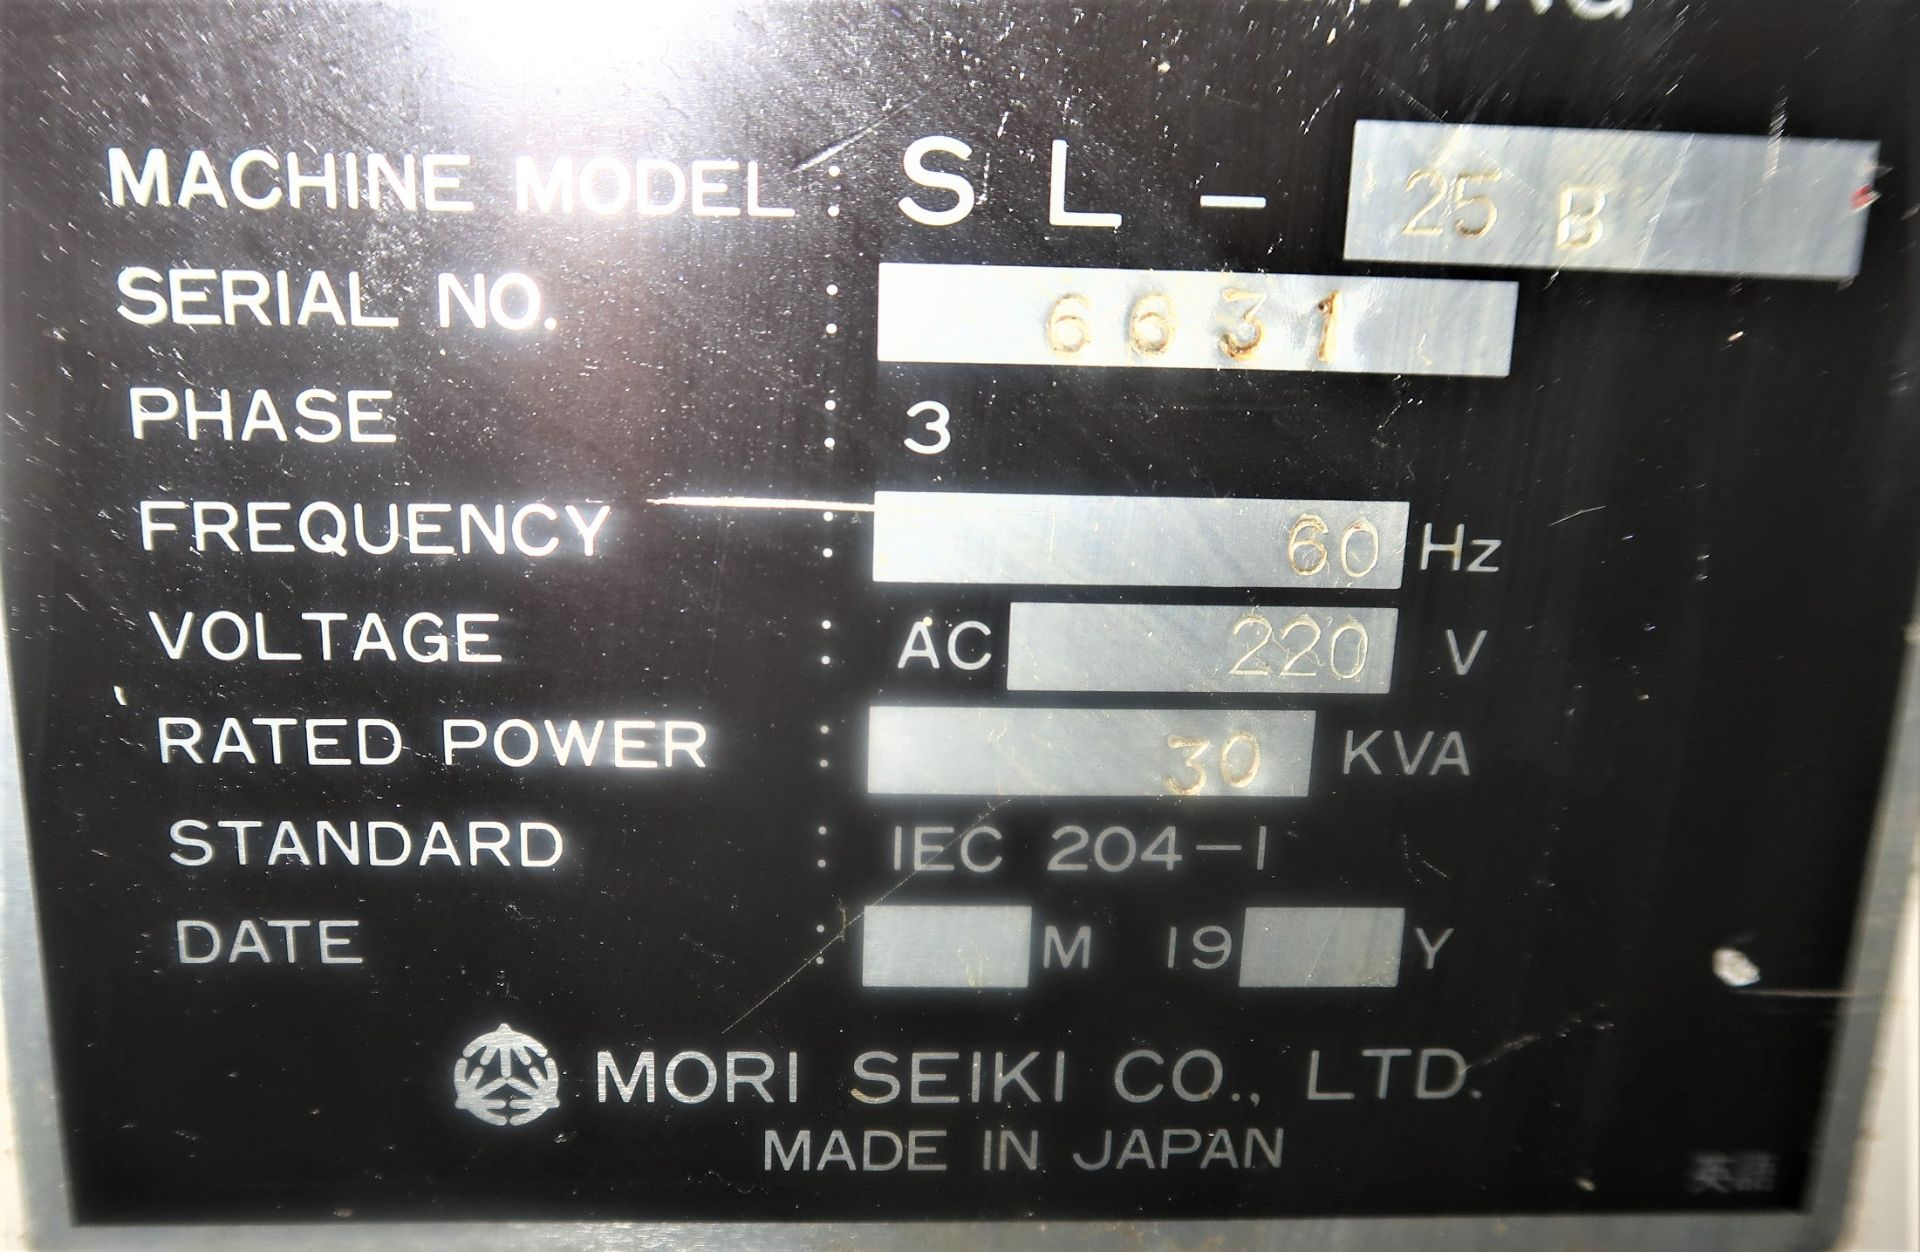 Lot 10D - MORI SEIKI SL-25 CNC 2-AXIS TURNING CENTER LATHE, S/N 6631